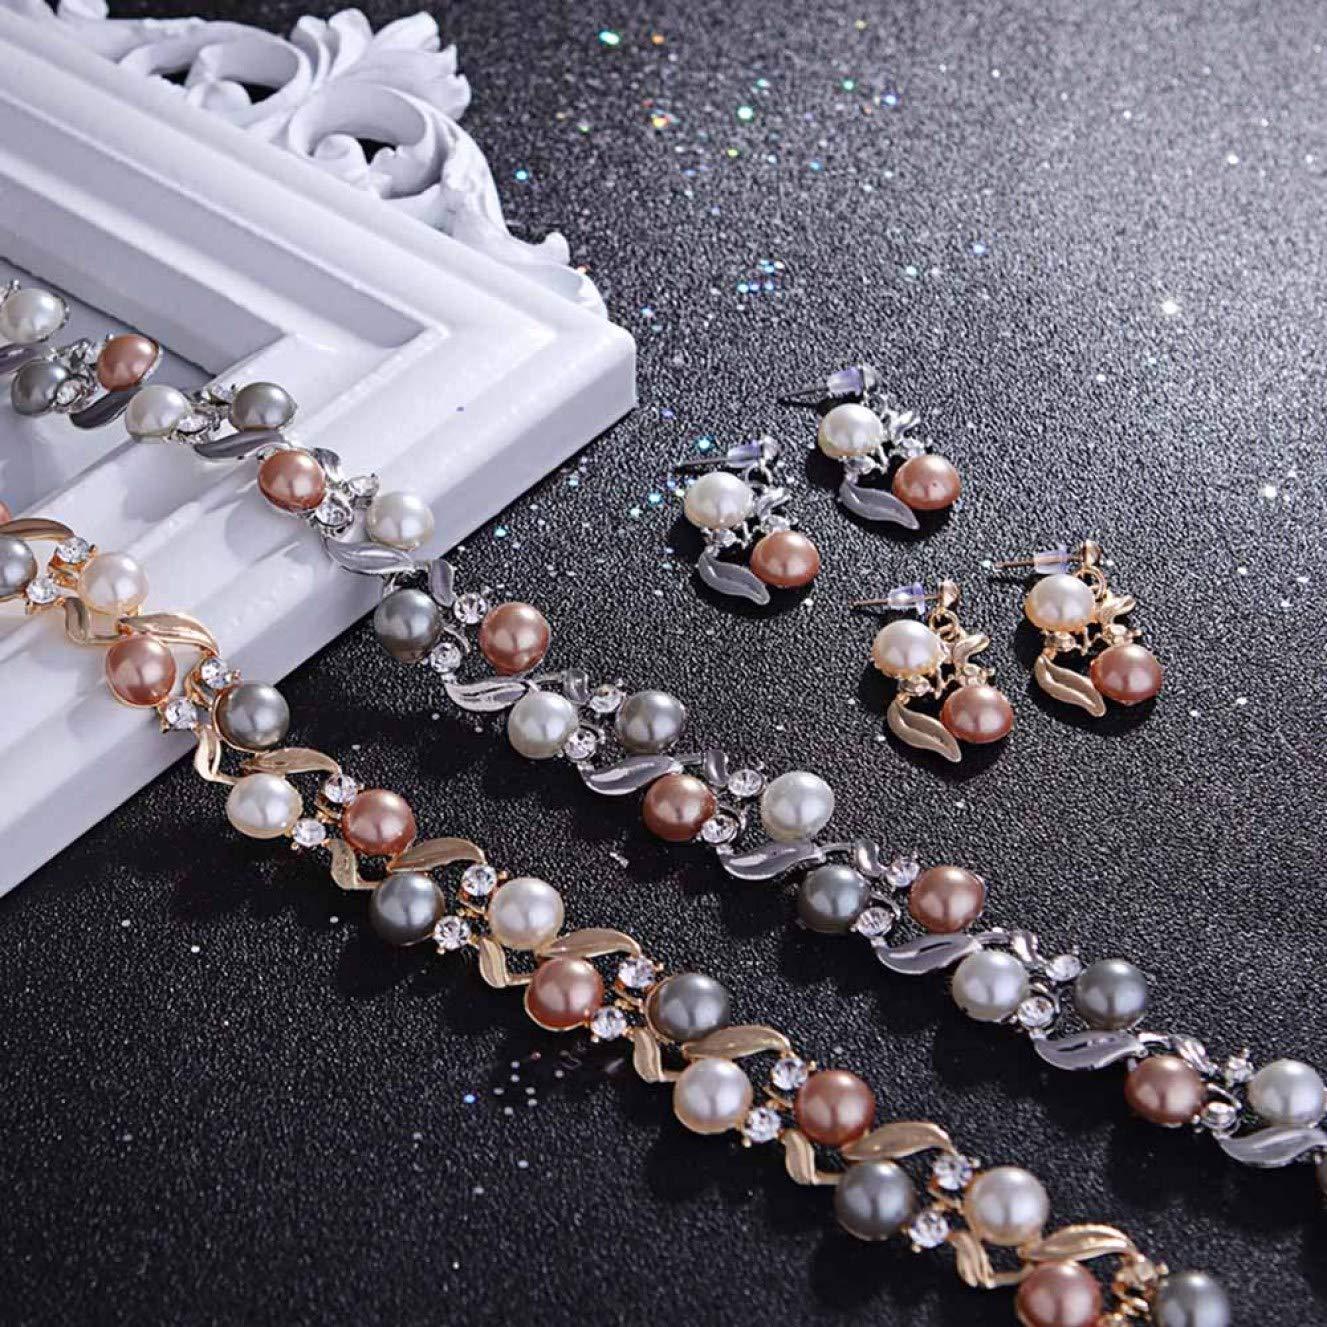 hkgdh Elaborate Fashion Colourful Imitation Pearl Necklace Stud Earrings Set of 2 Female Temperament Fashion Alloy Pendant Earrings Set Festival Gift